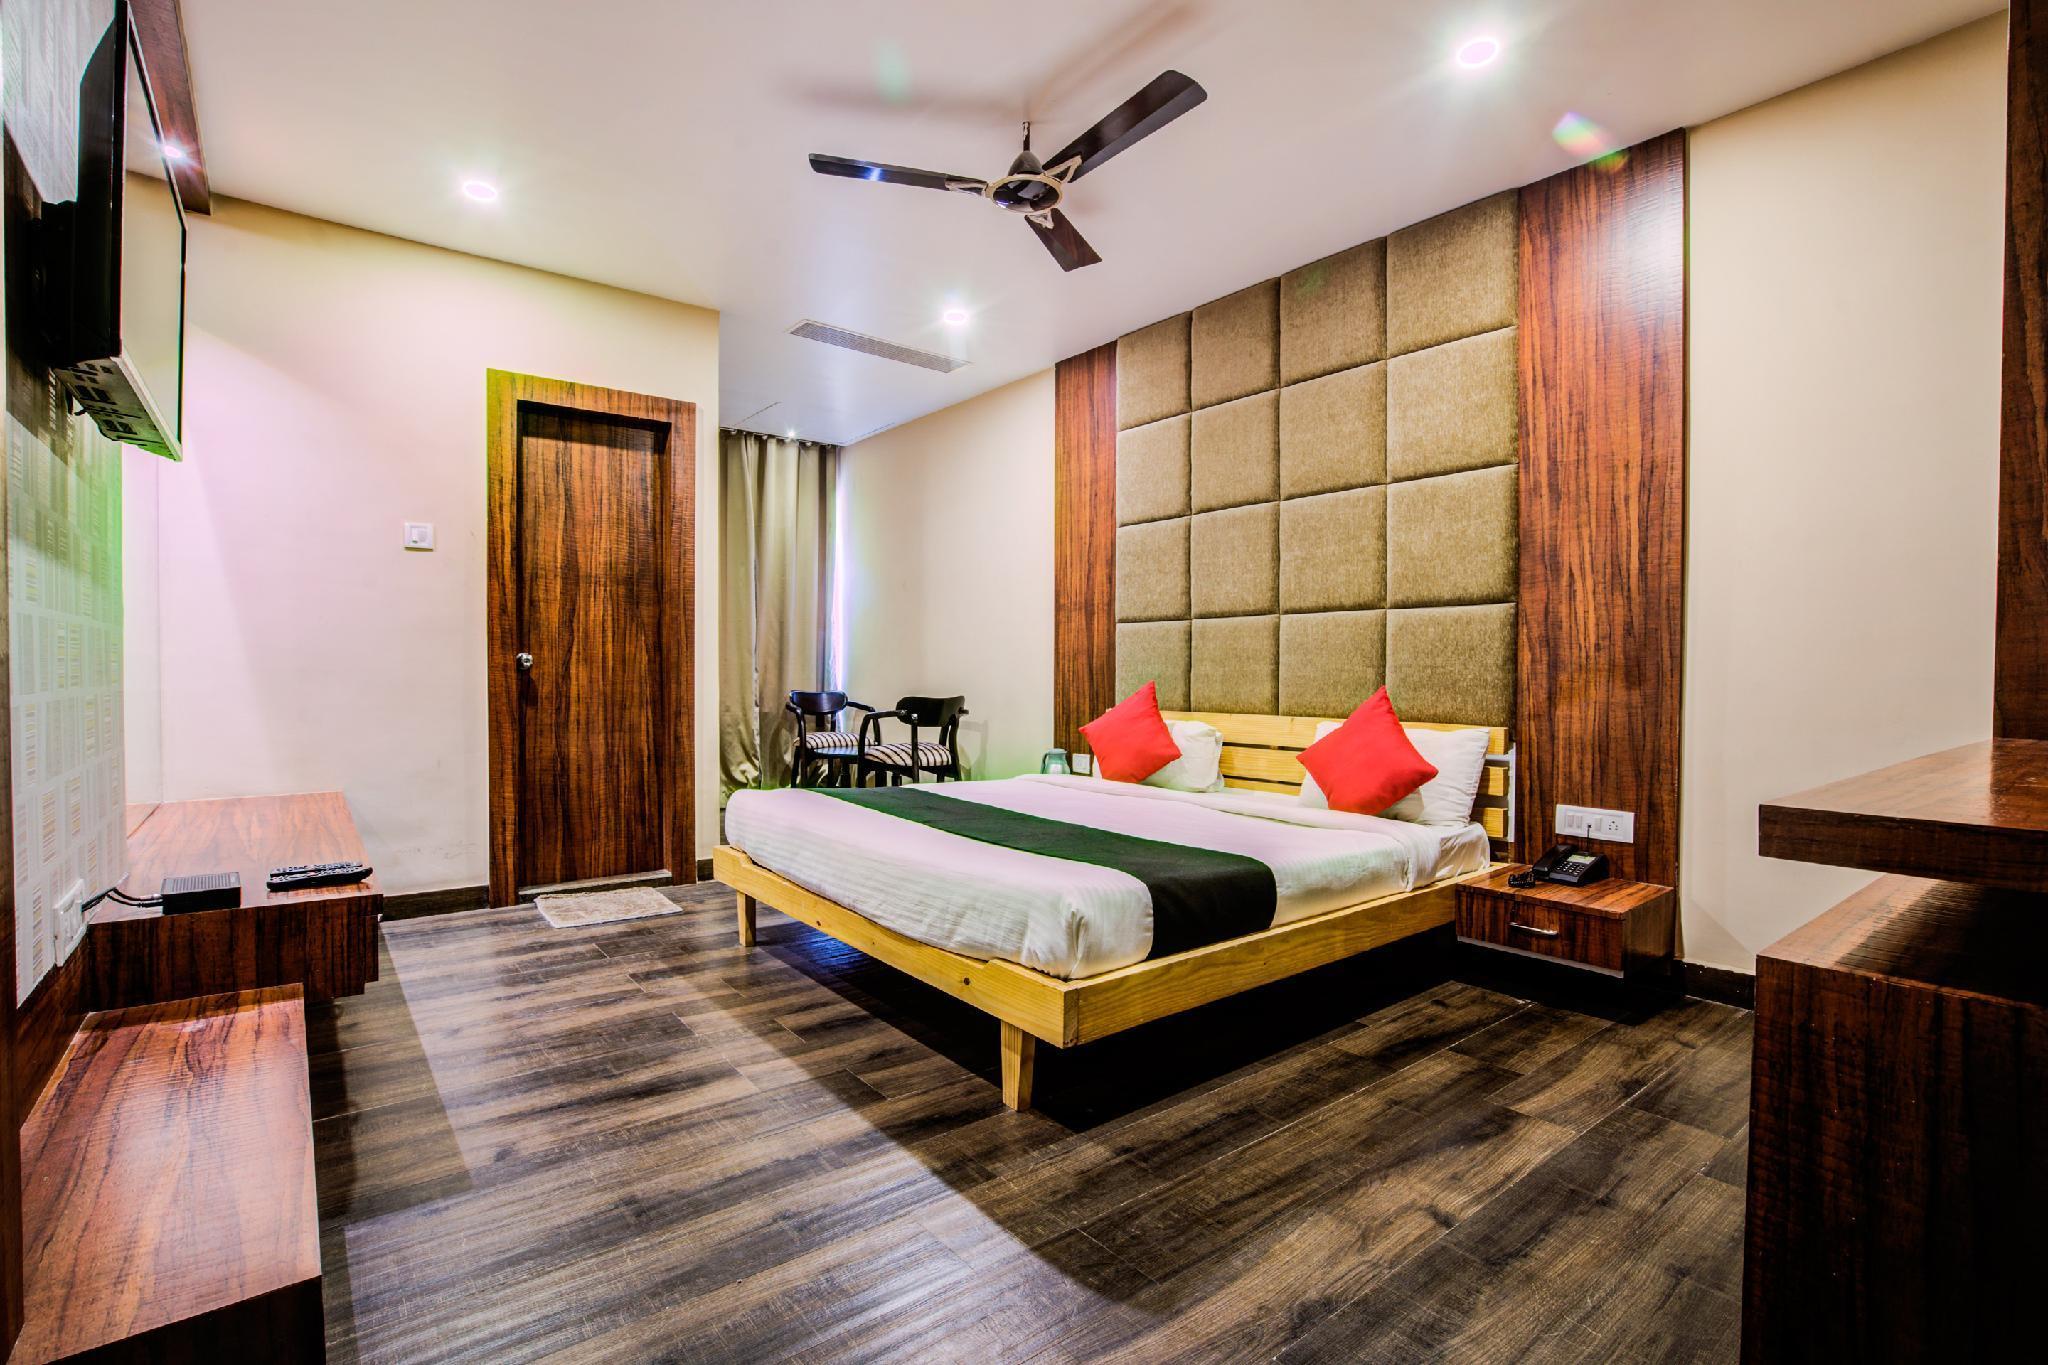 Capital O 35367 Hotel West Inn